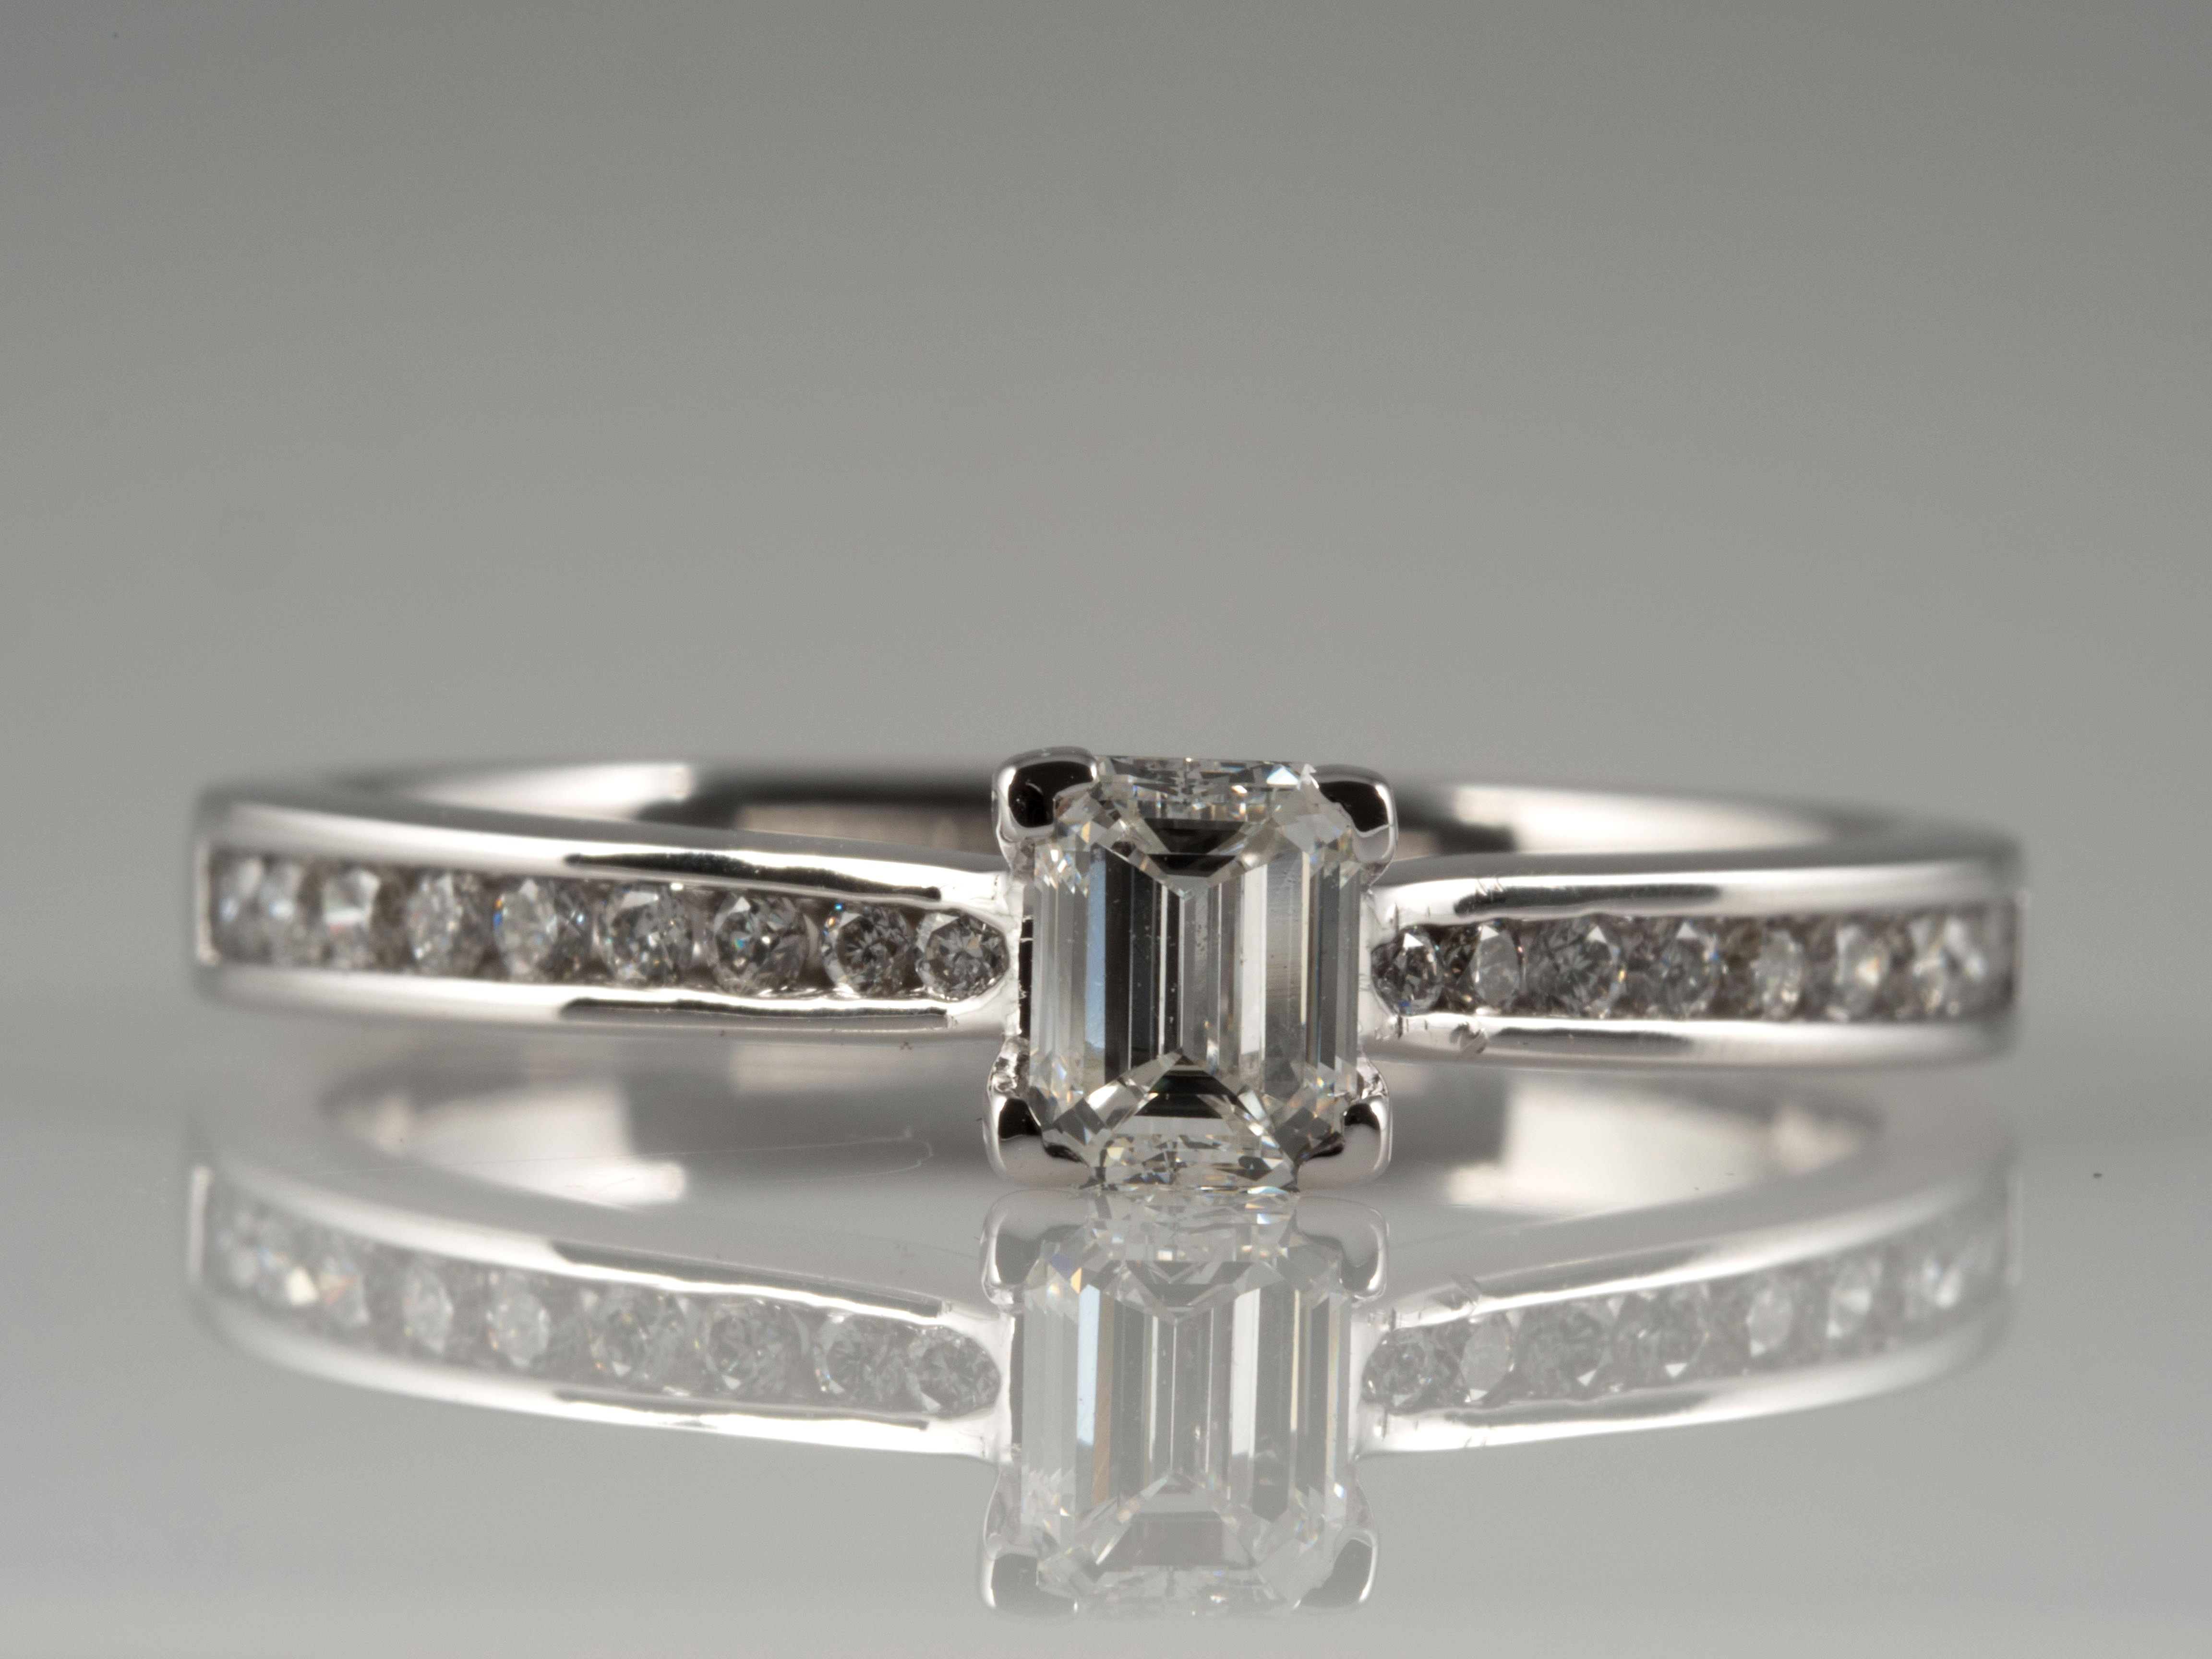 verlobung ring brillanten solit r diamant 750 gold wert eur ebay. Black Bedroom Furniture Sets. Home Design Ideas